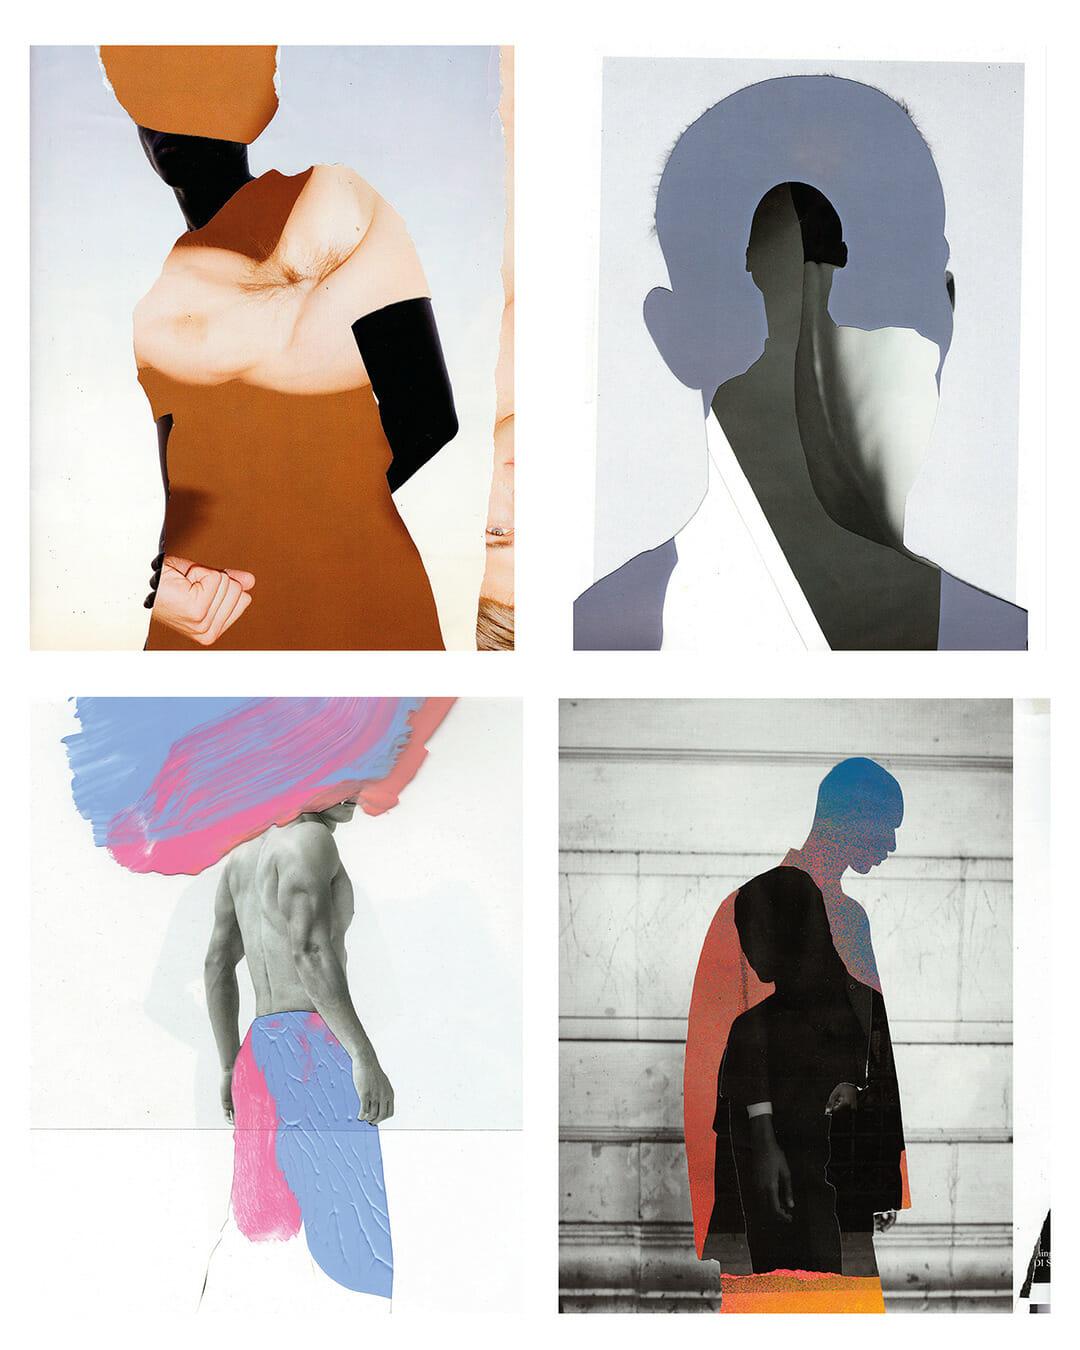 Collage masculinités Julen Iztueta